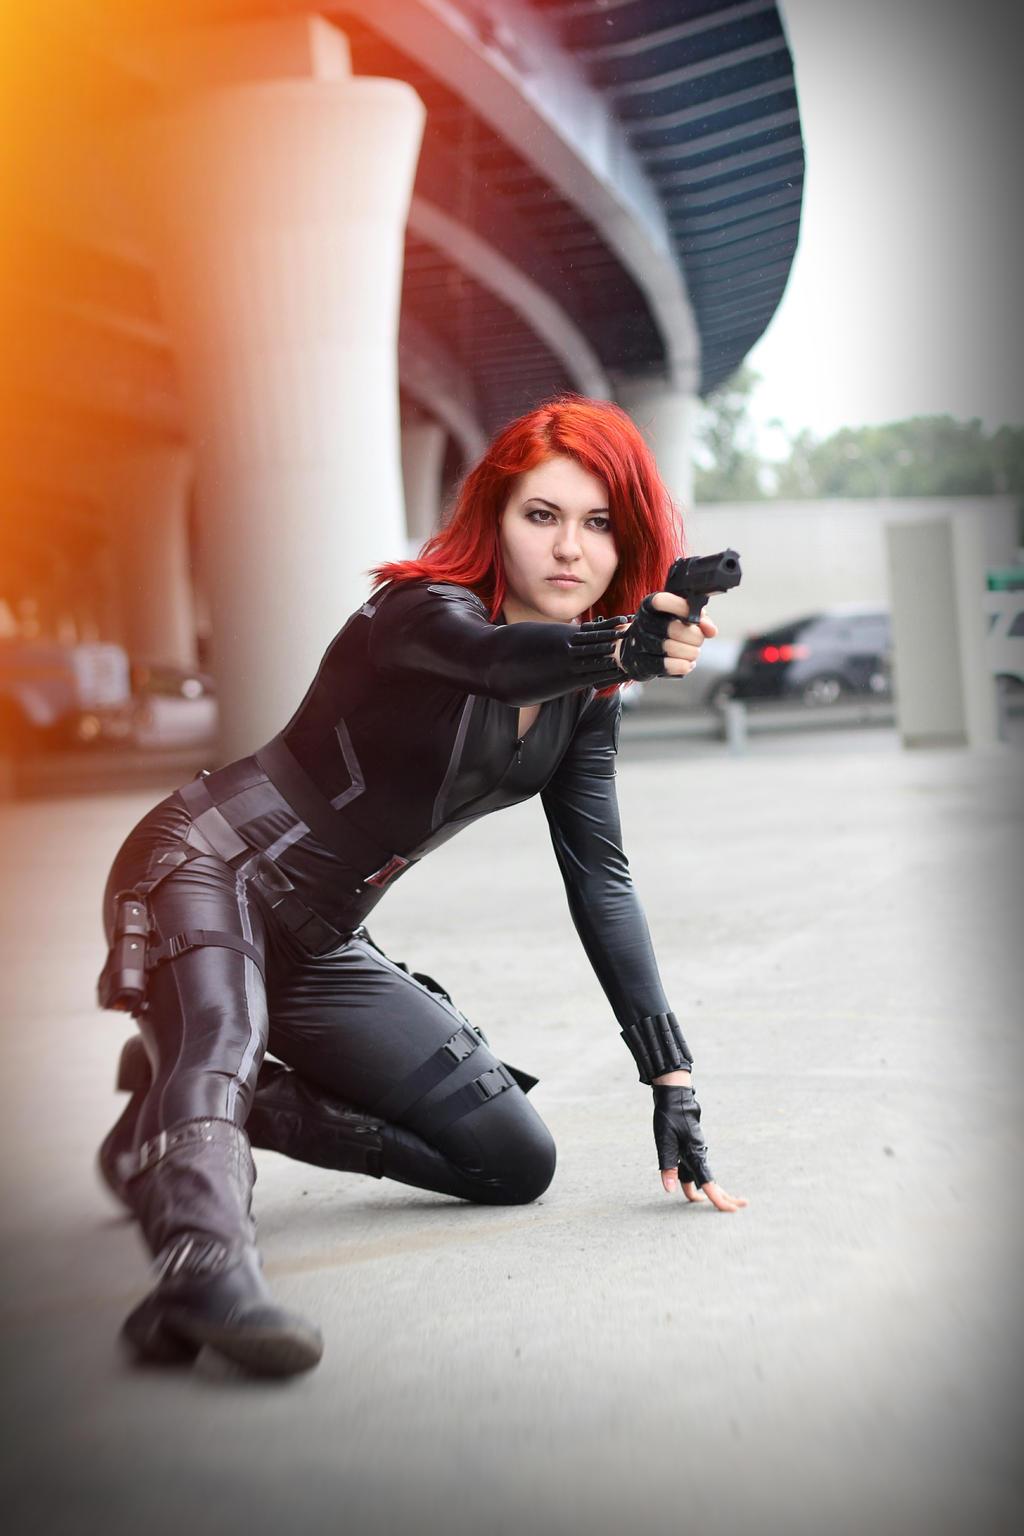 Black Widow Cosplay by mysteria-violent on DeviantArt